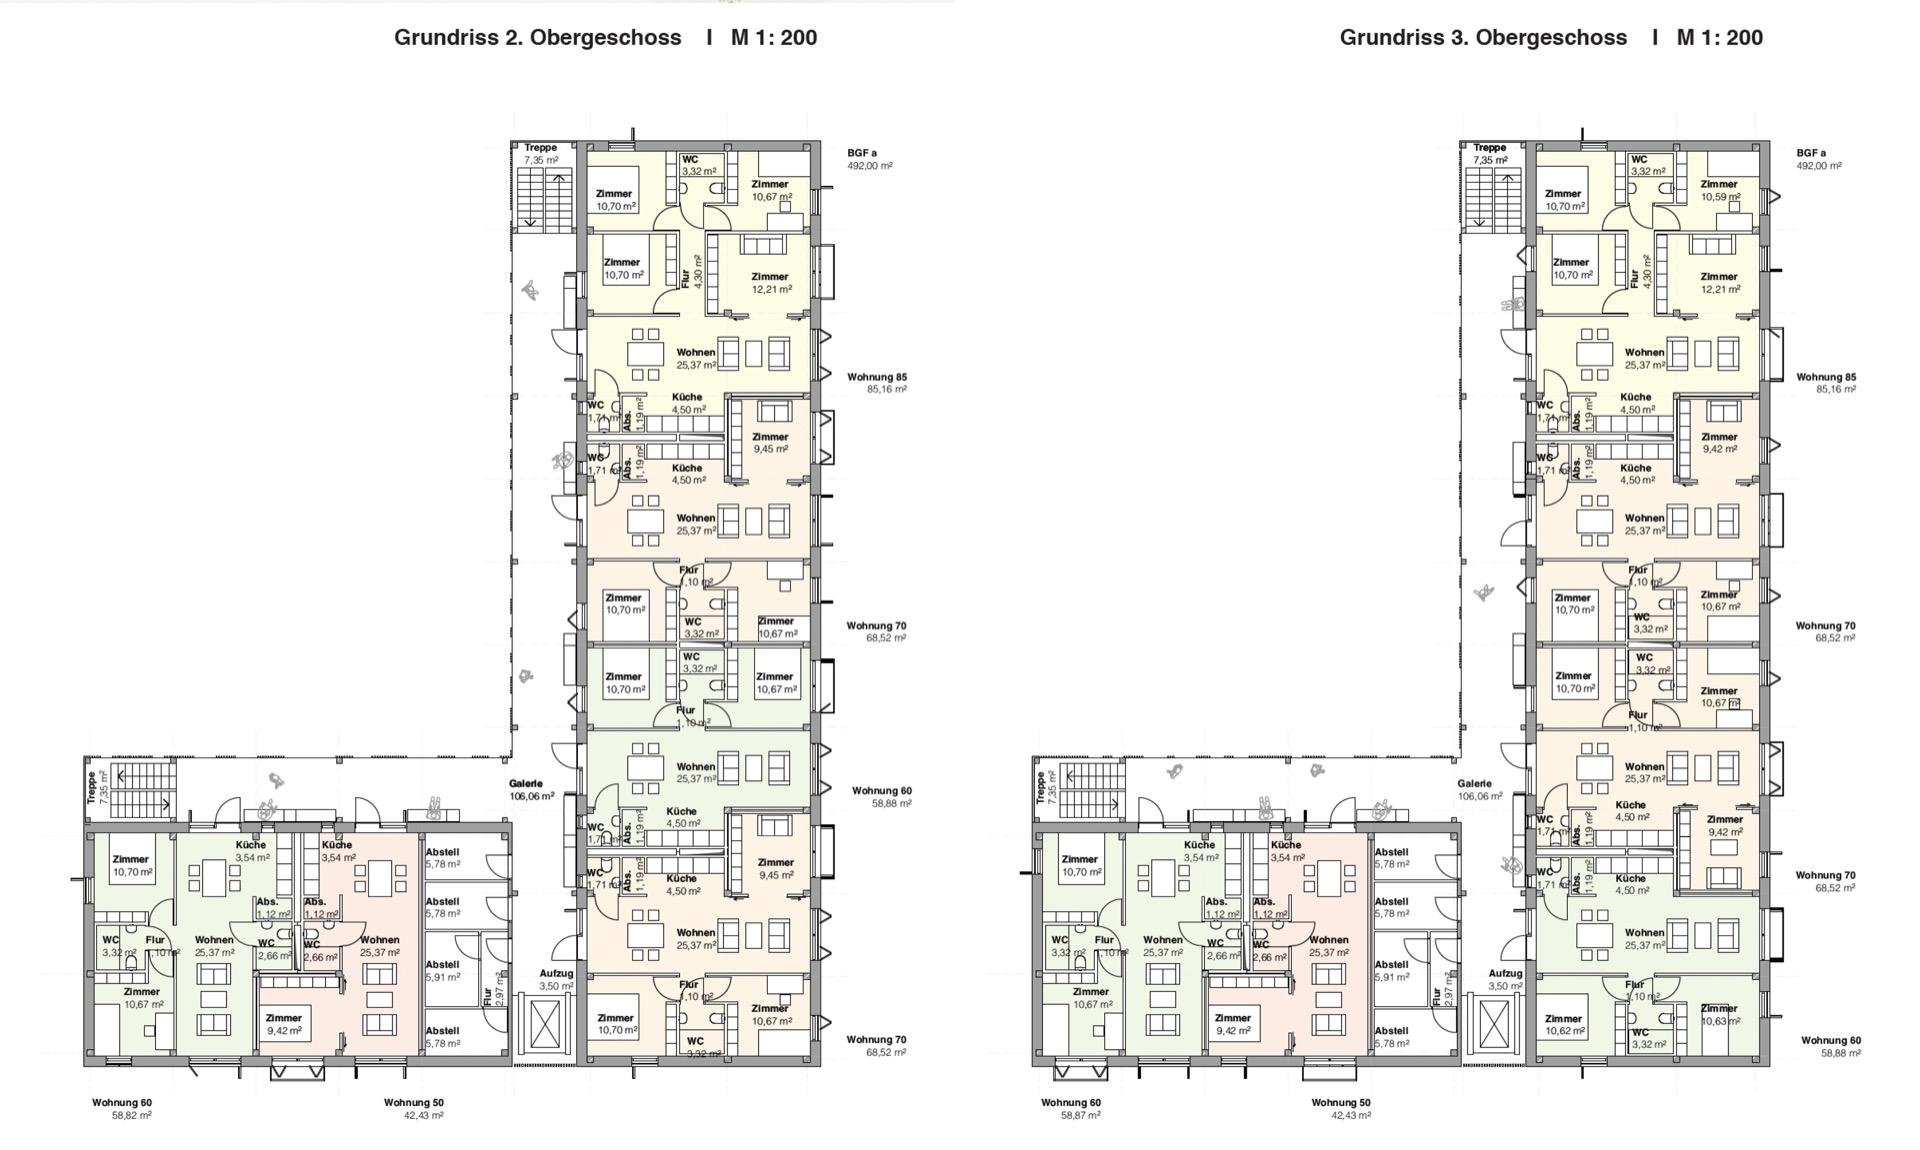 Grundrisse © Architekten BDA Feldschnieders + Kister